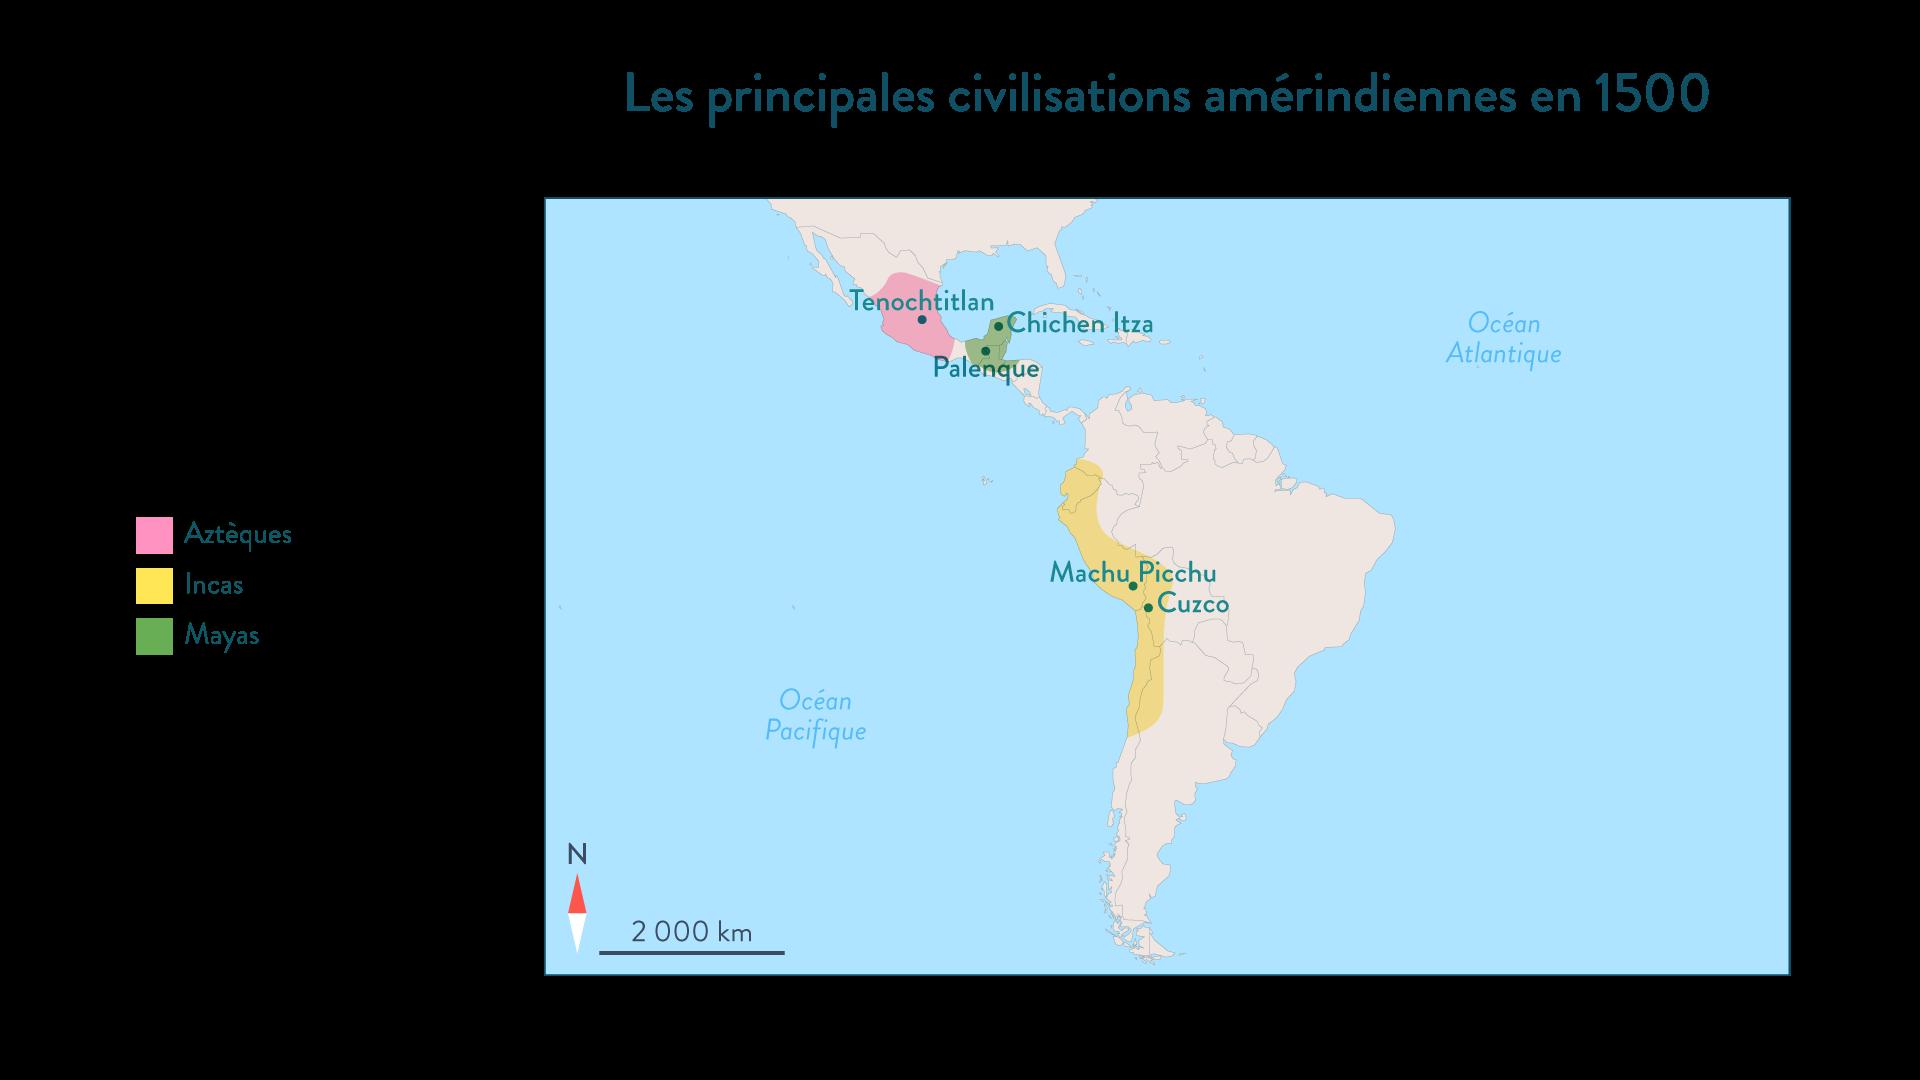 Carte des principales civilisations amérindiennes en1500 - Histoire - 2de - SchoolMouv